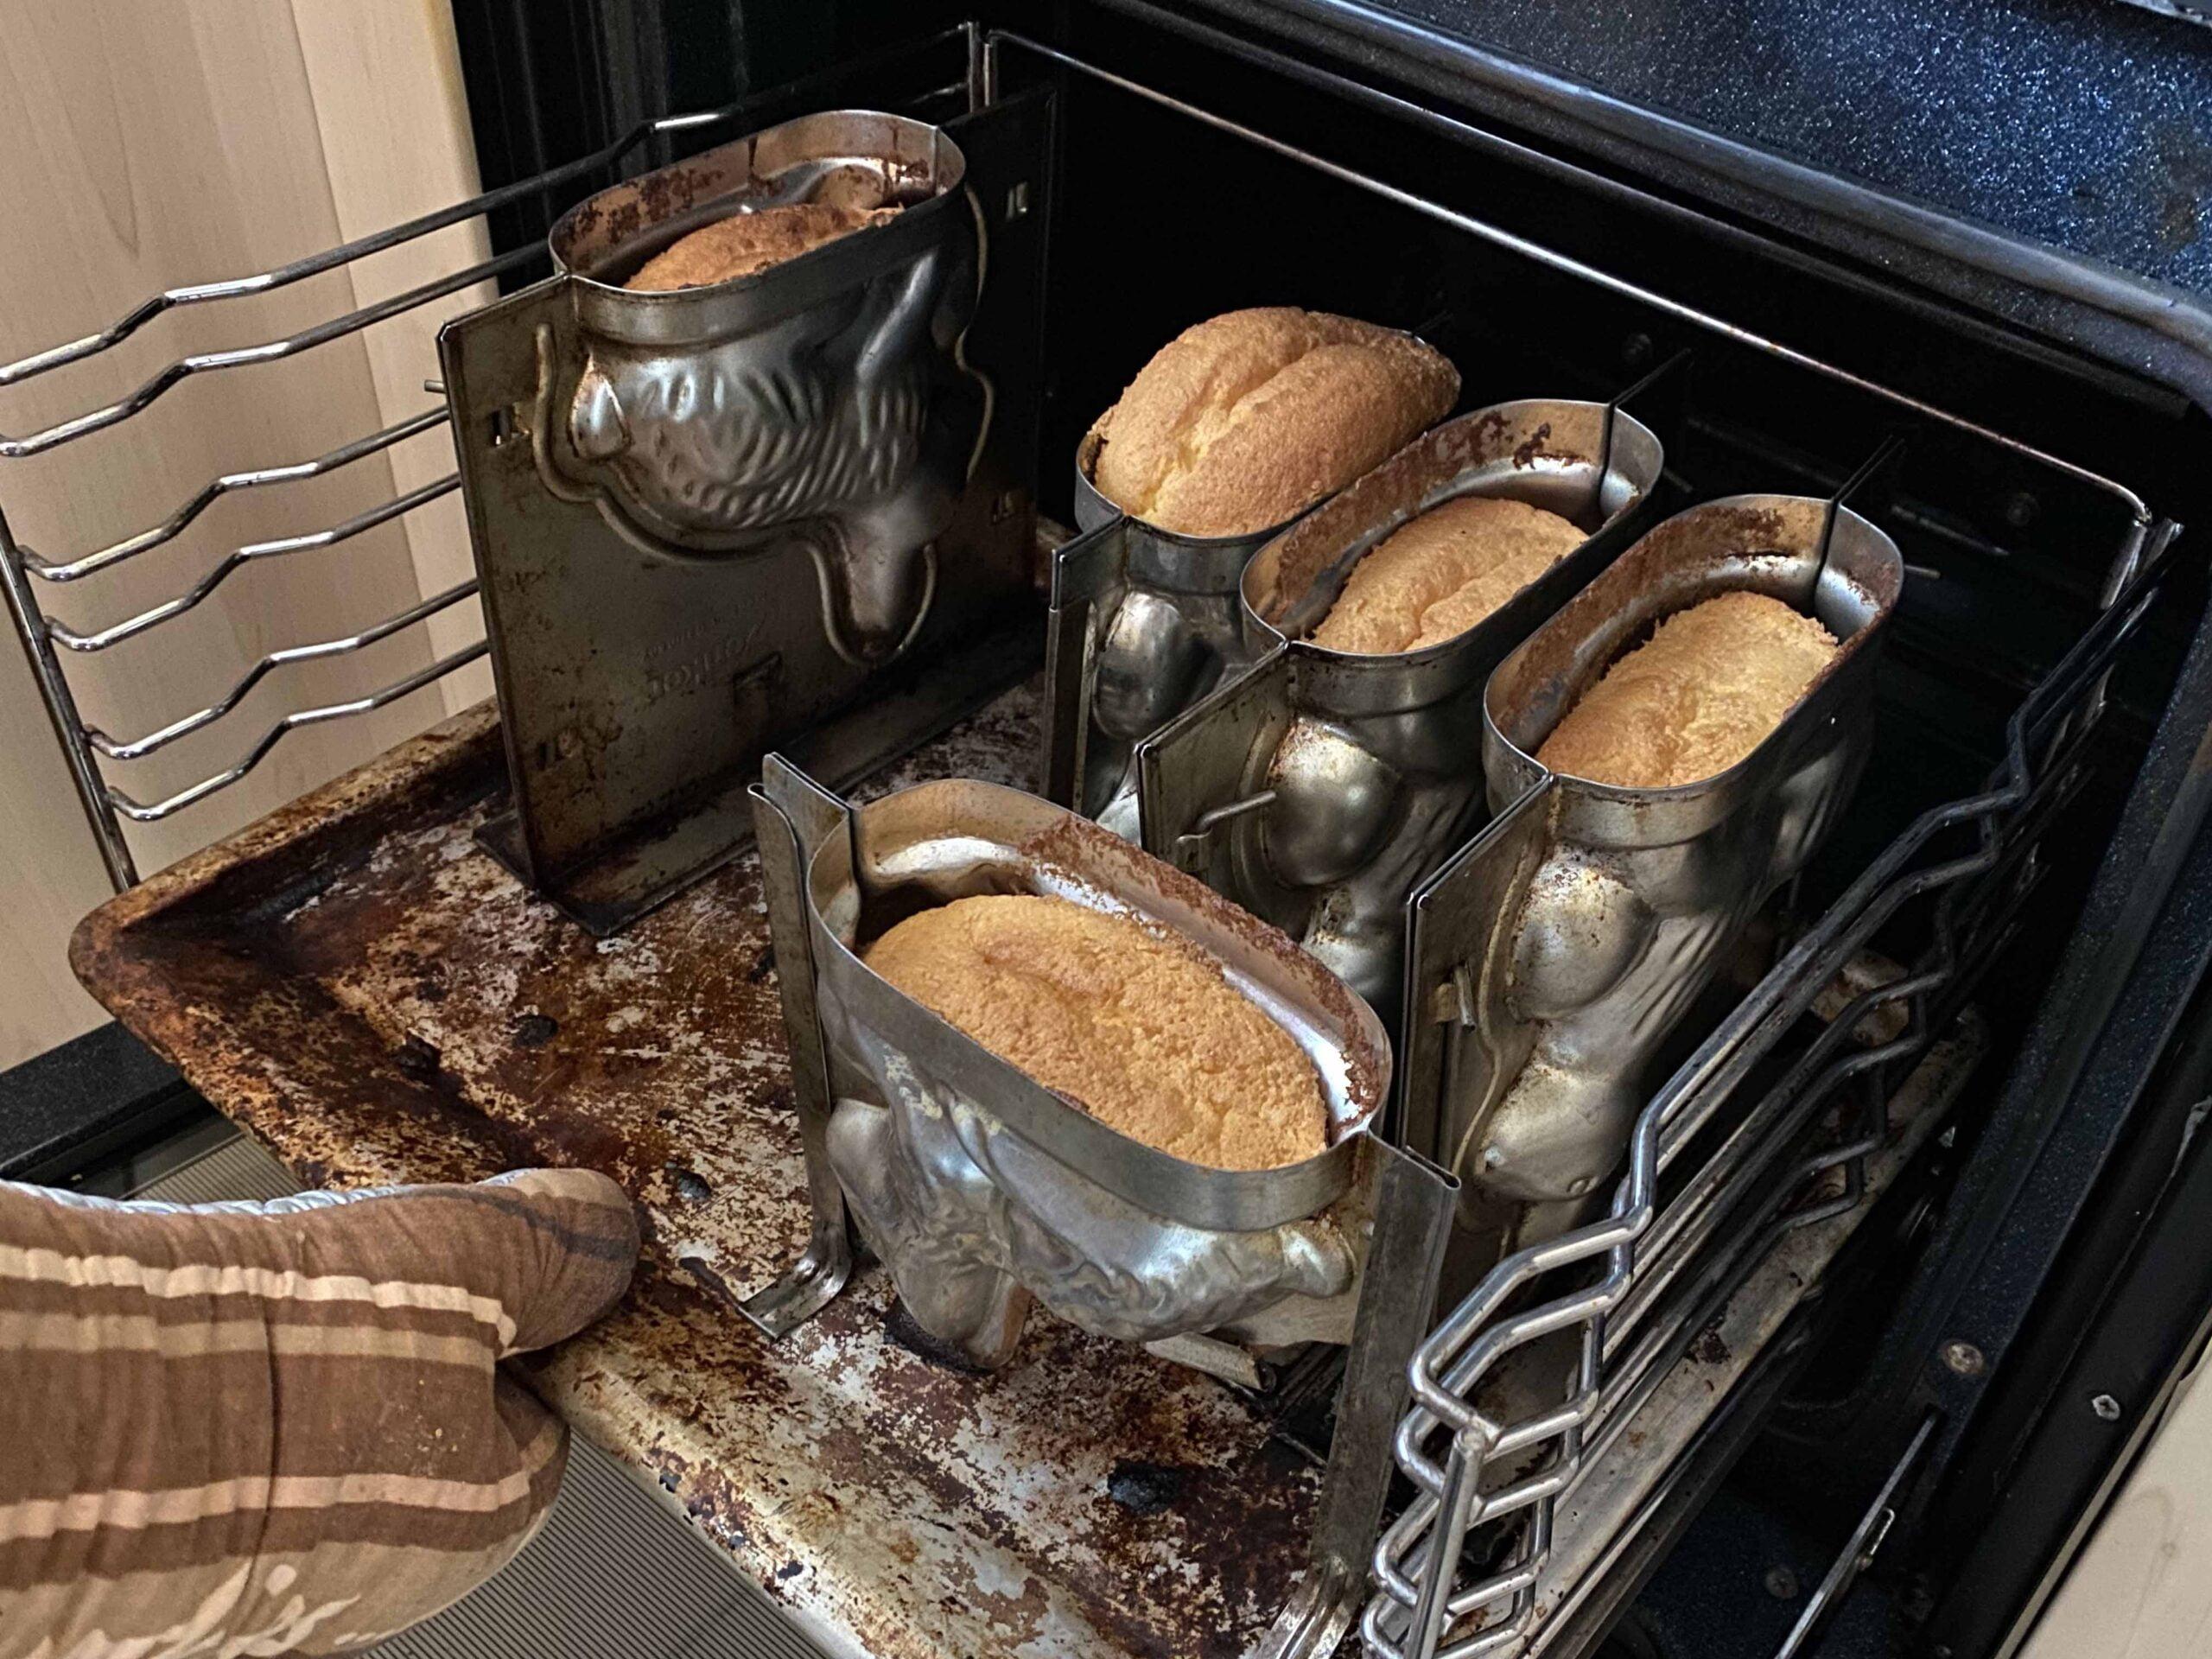 easter bunny eggnog cake baking in oven